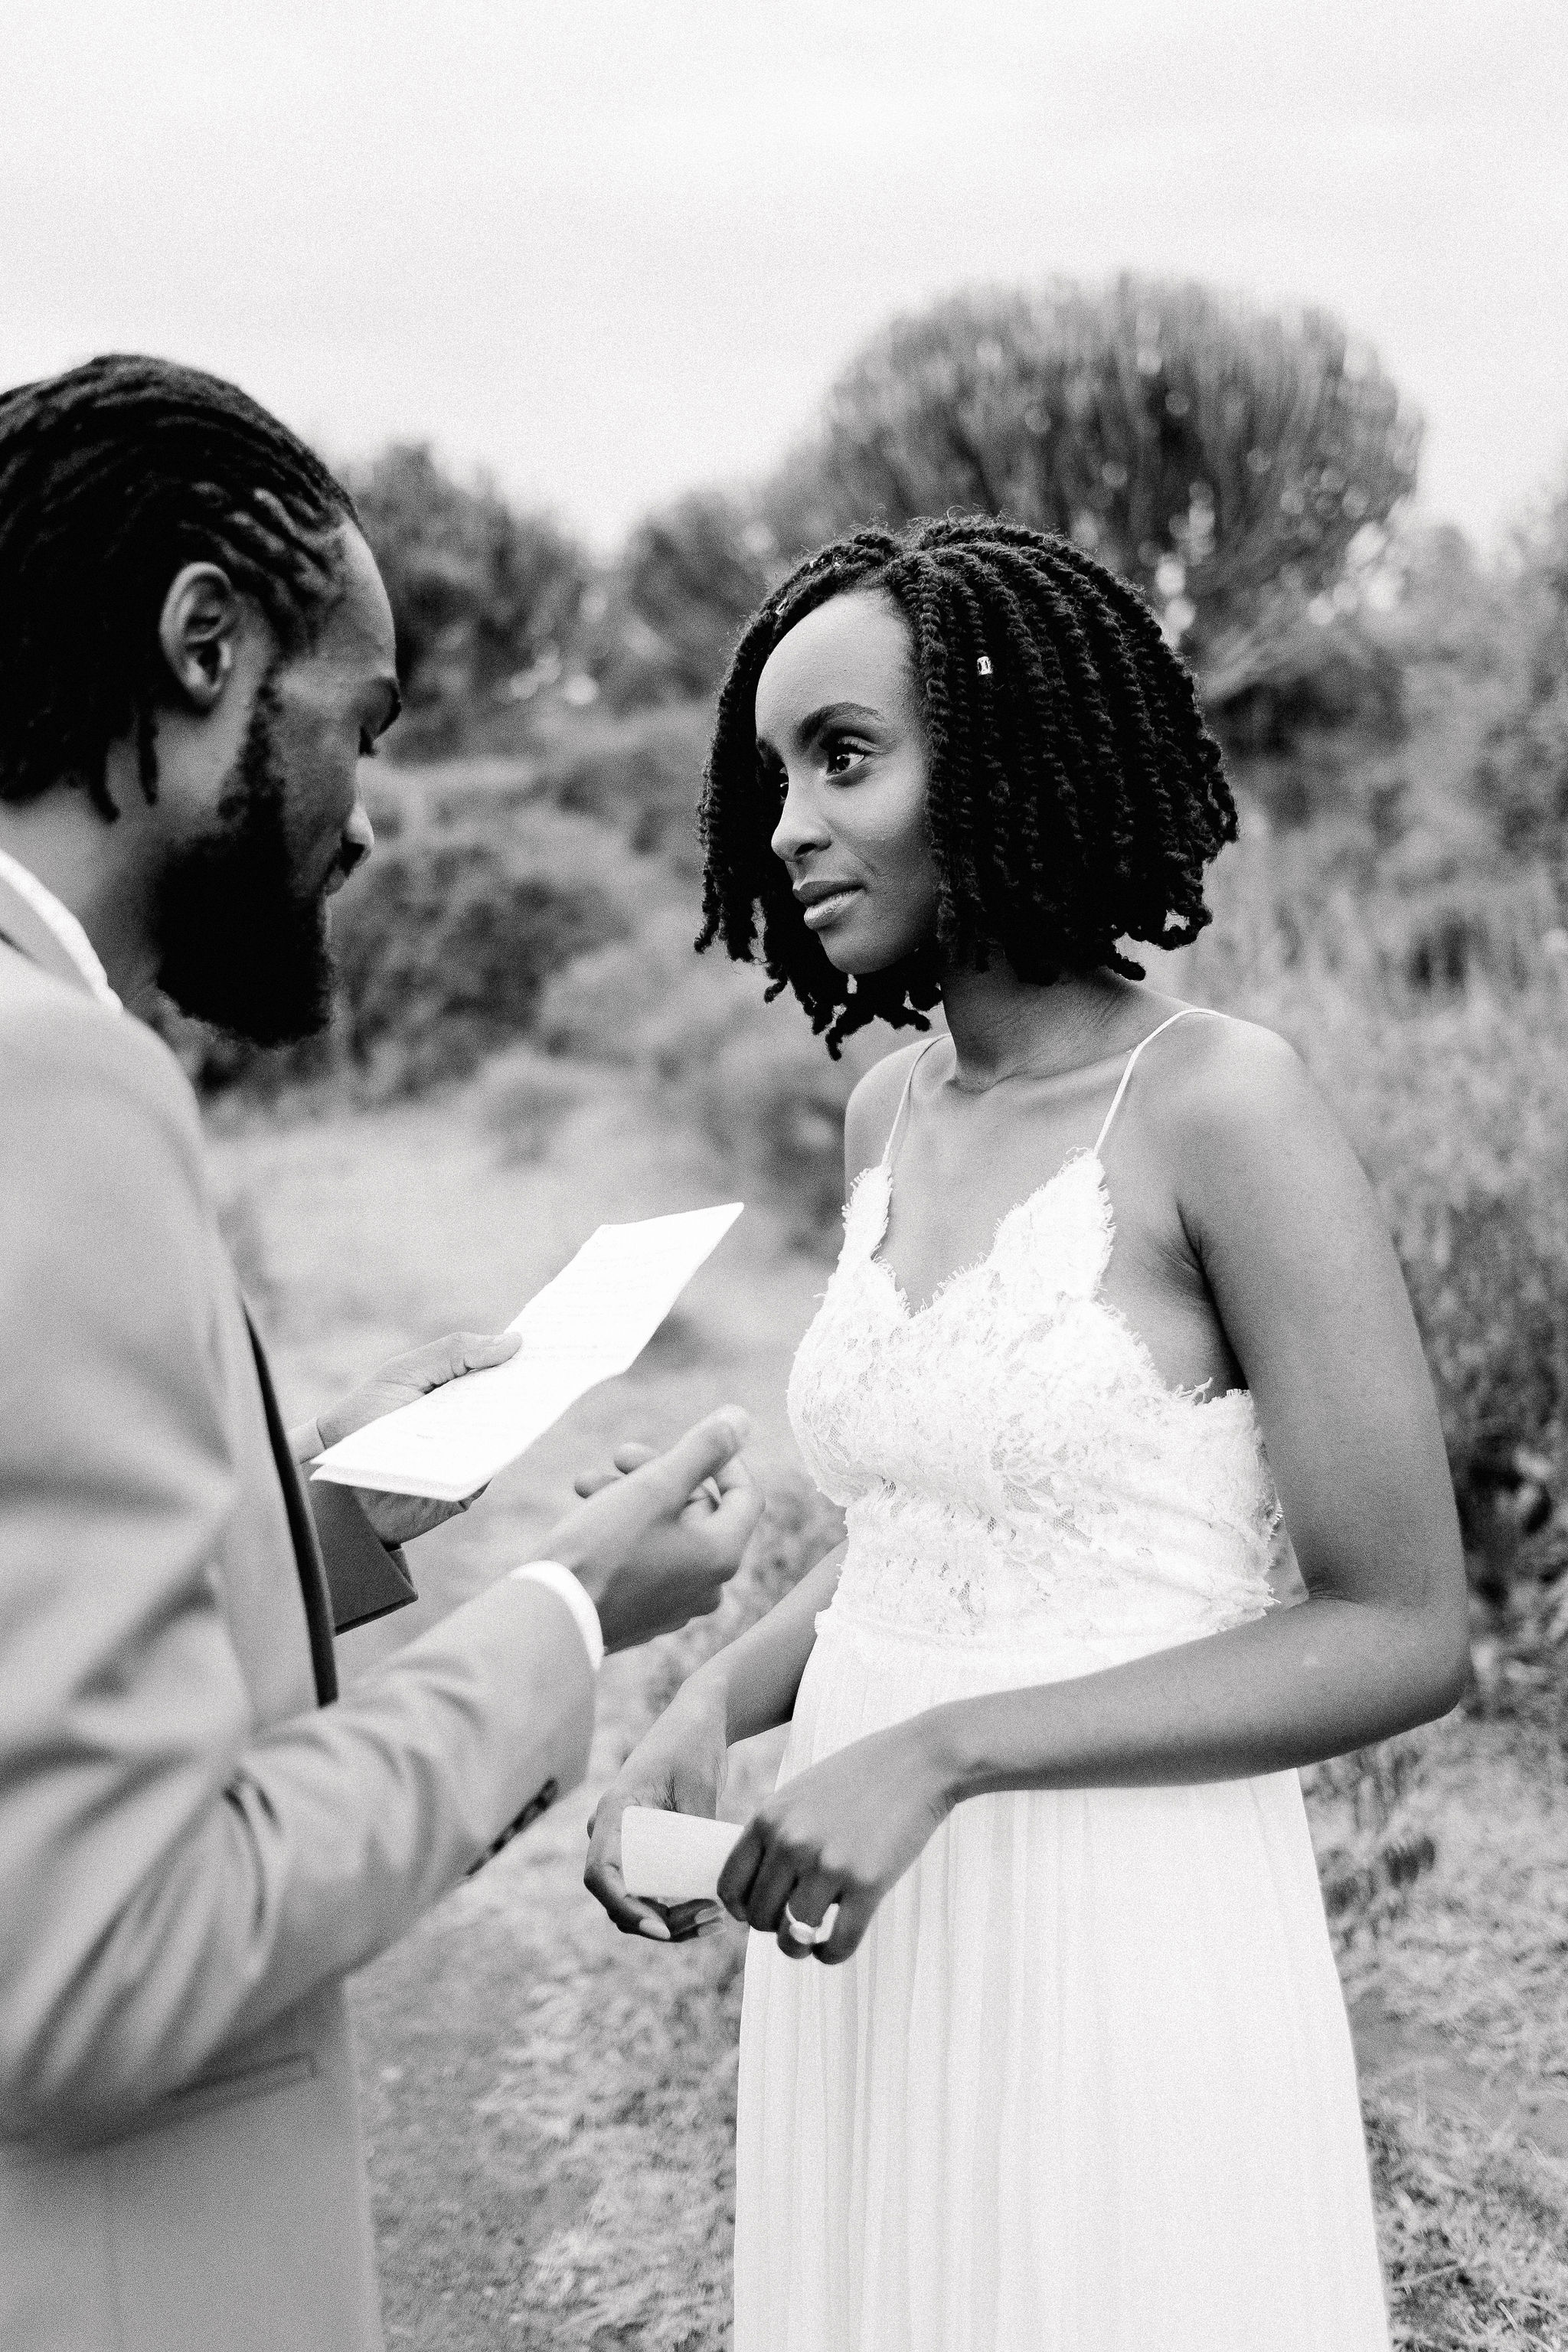 Anna-Hari-Photography-Destination-Wedding-Photographer-Kenya-139.jpg